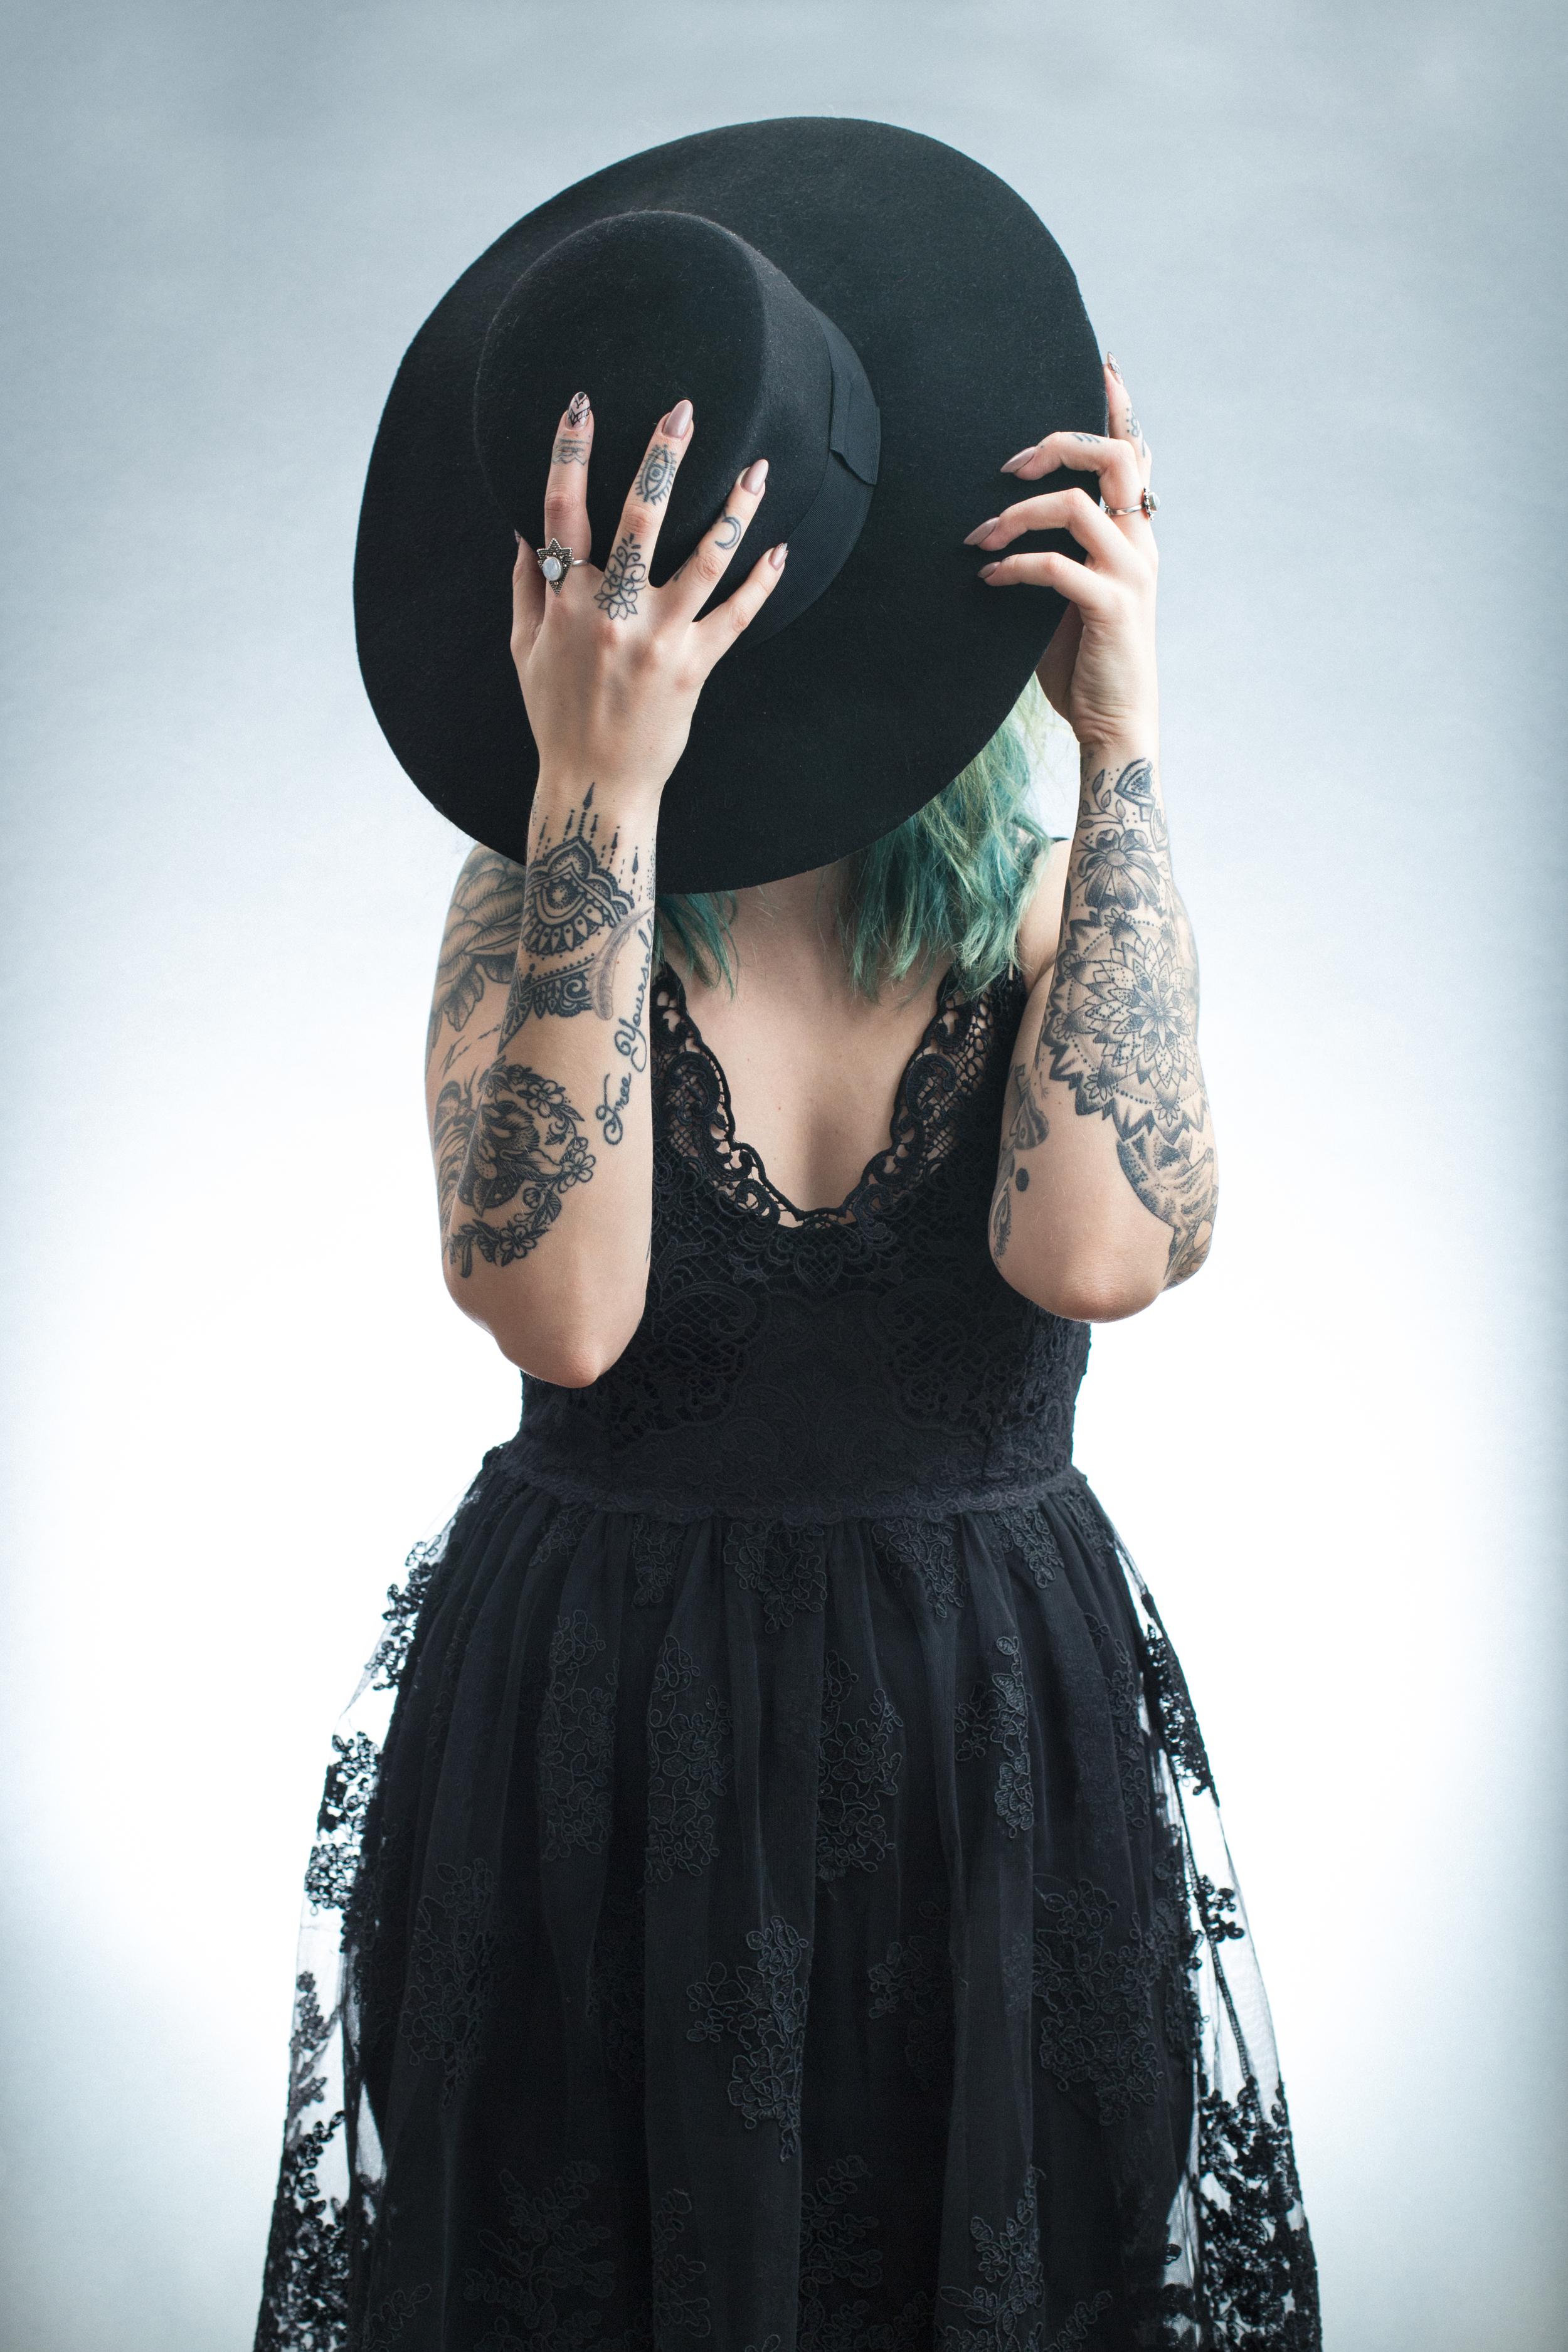 dress: LUNA (Wasted Fashion)  hat: H&M